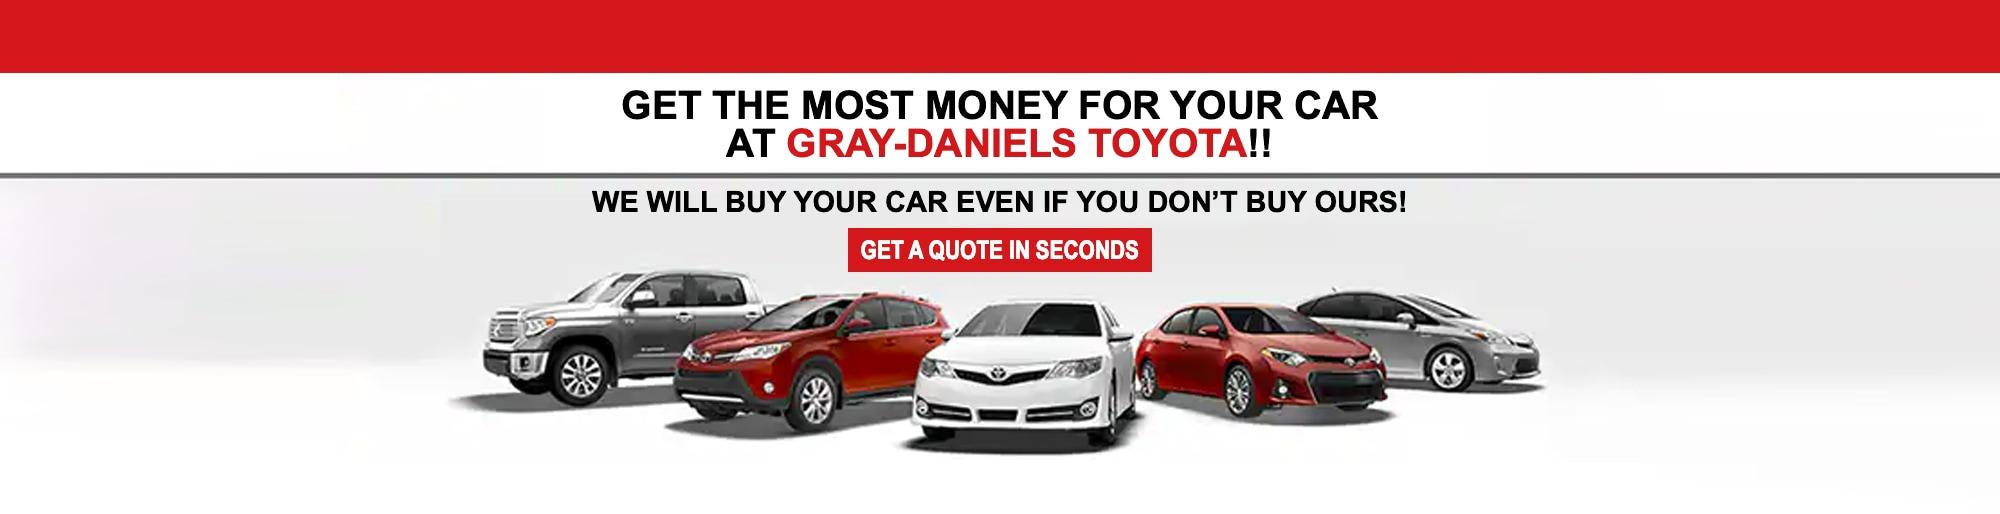 Gray Daniels Toyota Toyota Dealership In Brandon Ms Near Jackson